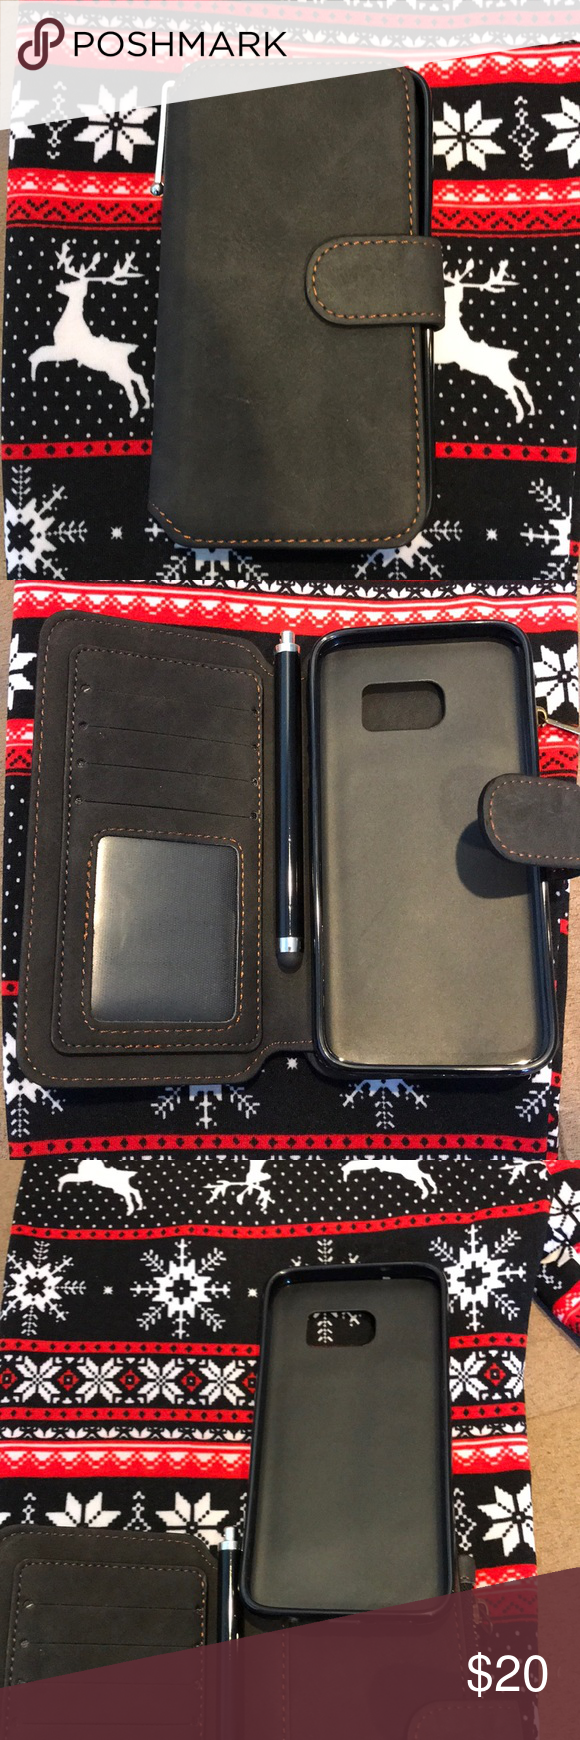 Cell Phone Wallet Cell phone wallet, Phone wallet, Wallet